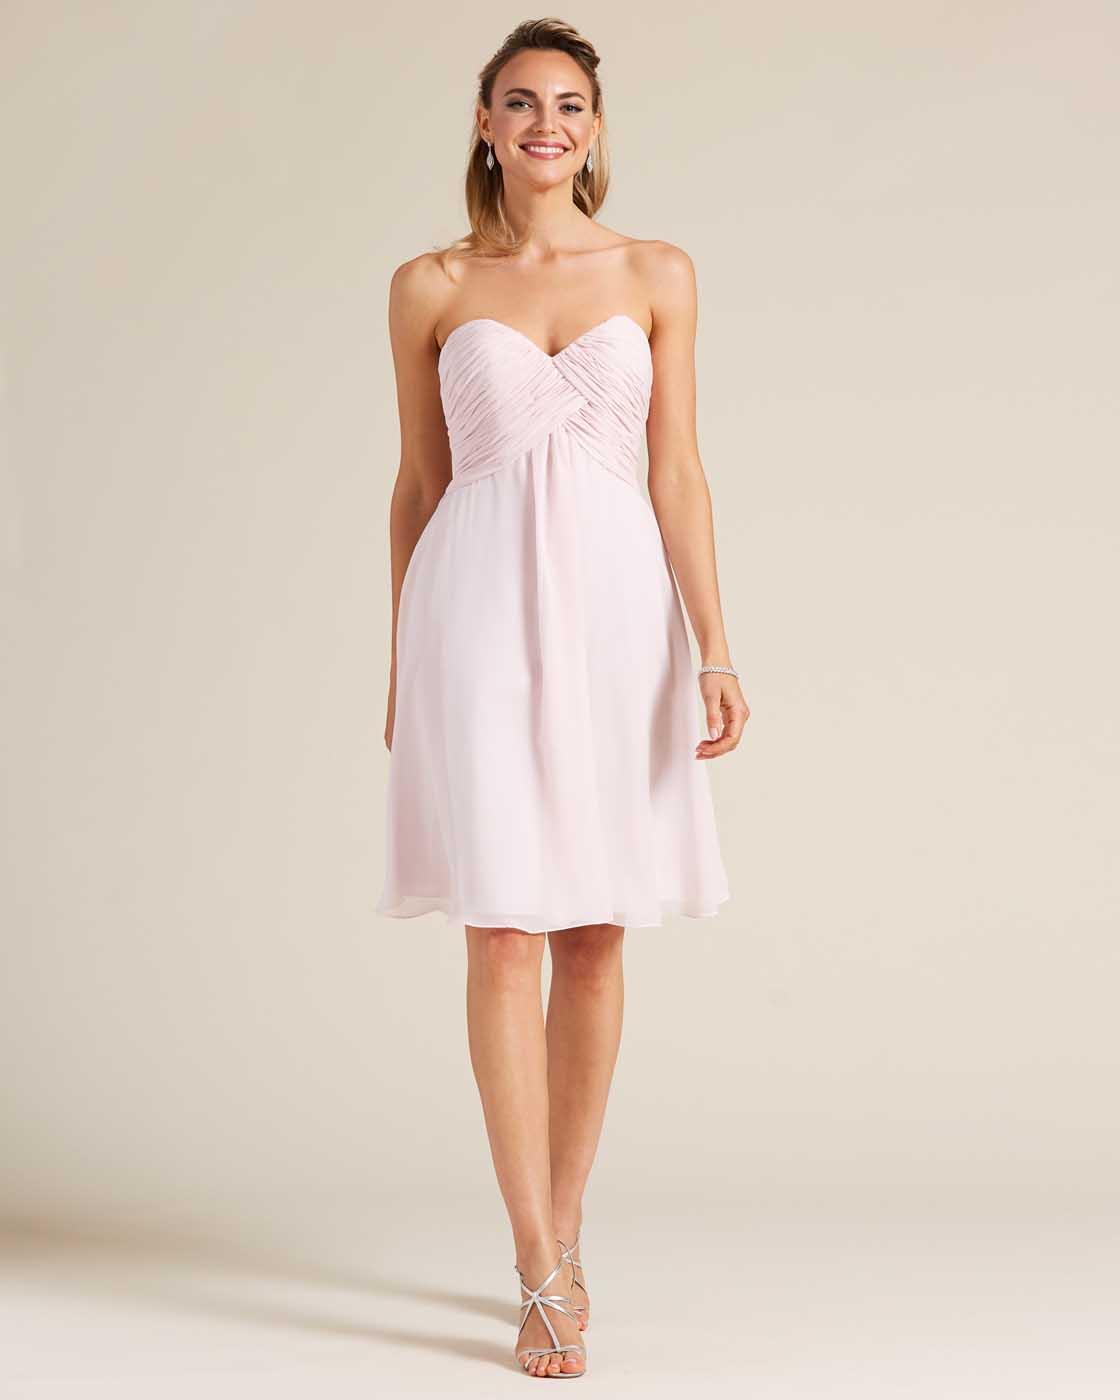 Pink Strapless Short Skirt Dress - Front